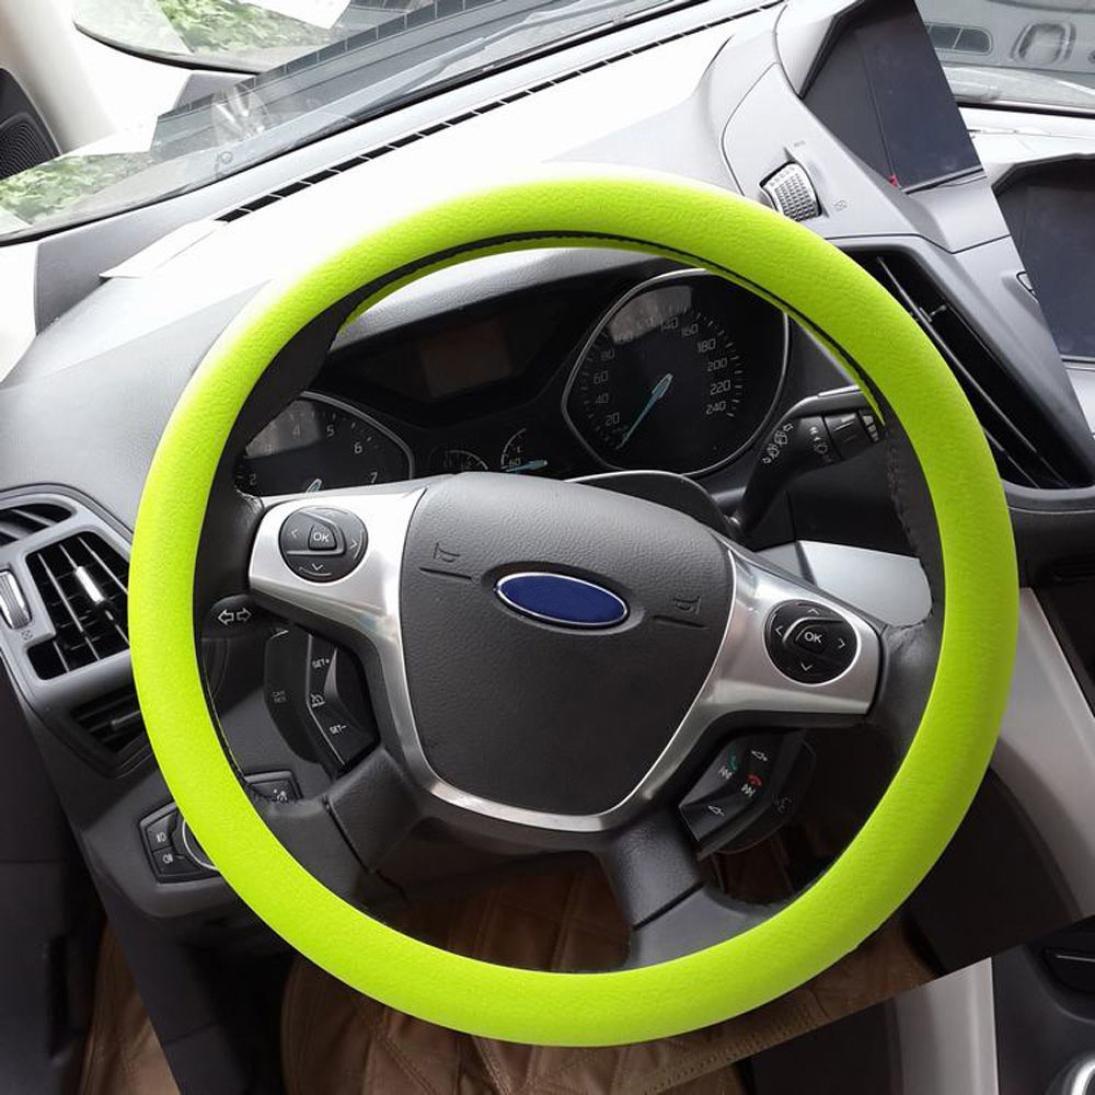 Orange Gessppo Anti-Slip Steering Wheel Cover Auto Car High Elastic Silicone Universal Steering Cover for Diameter 32-40cm//12-16inch